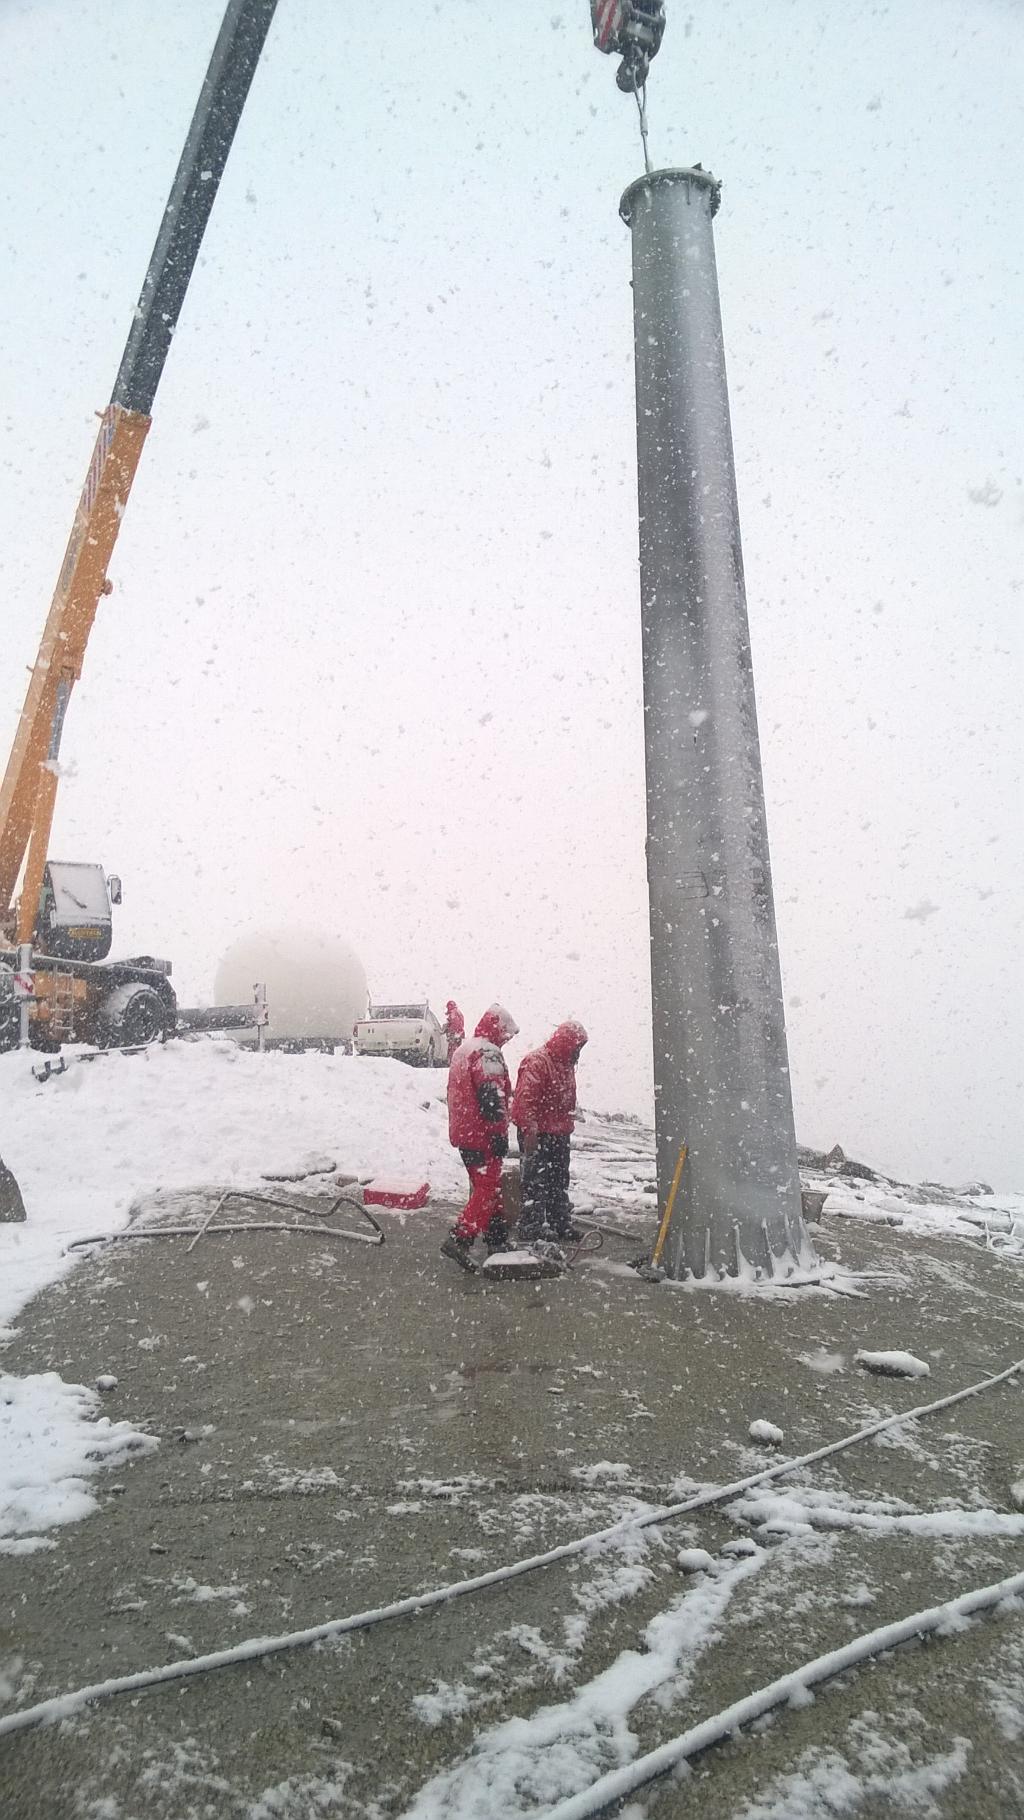 Impianto eolico sede antartica ENEA Mario Zucchelli